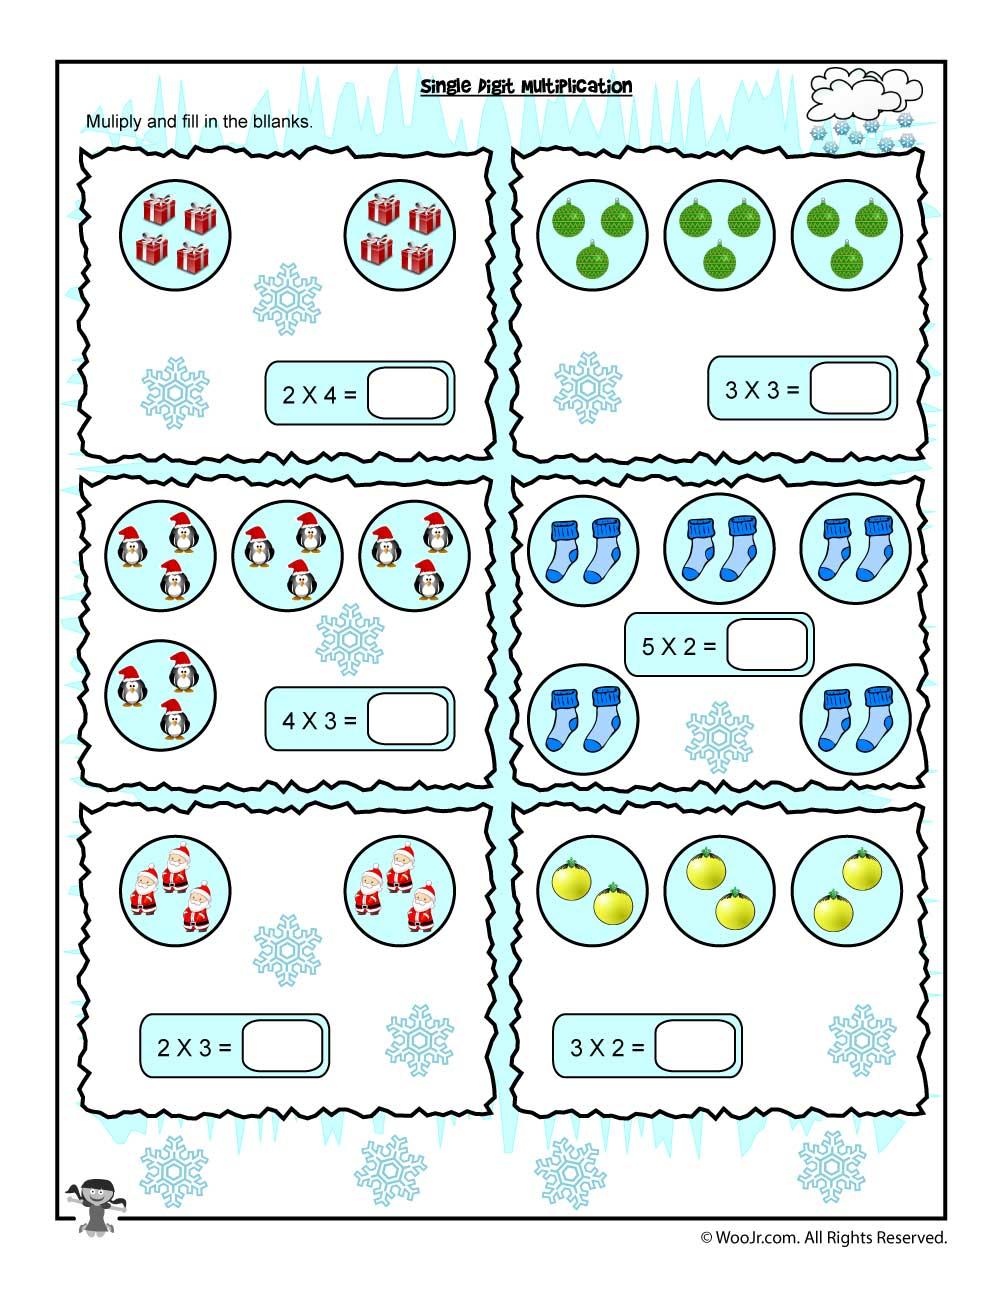 Single Digit Visual Counting Multiplication Worksheet